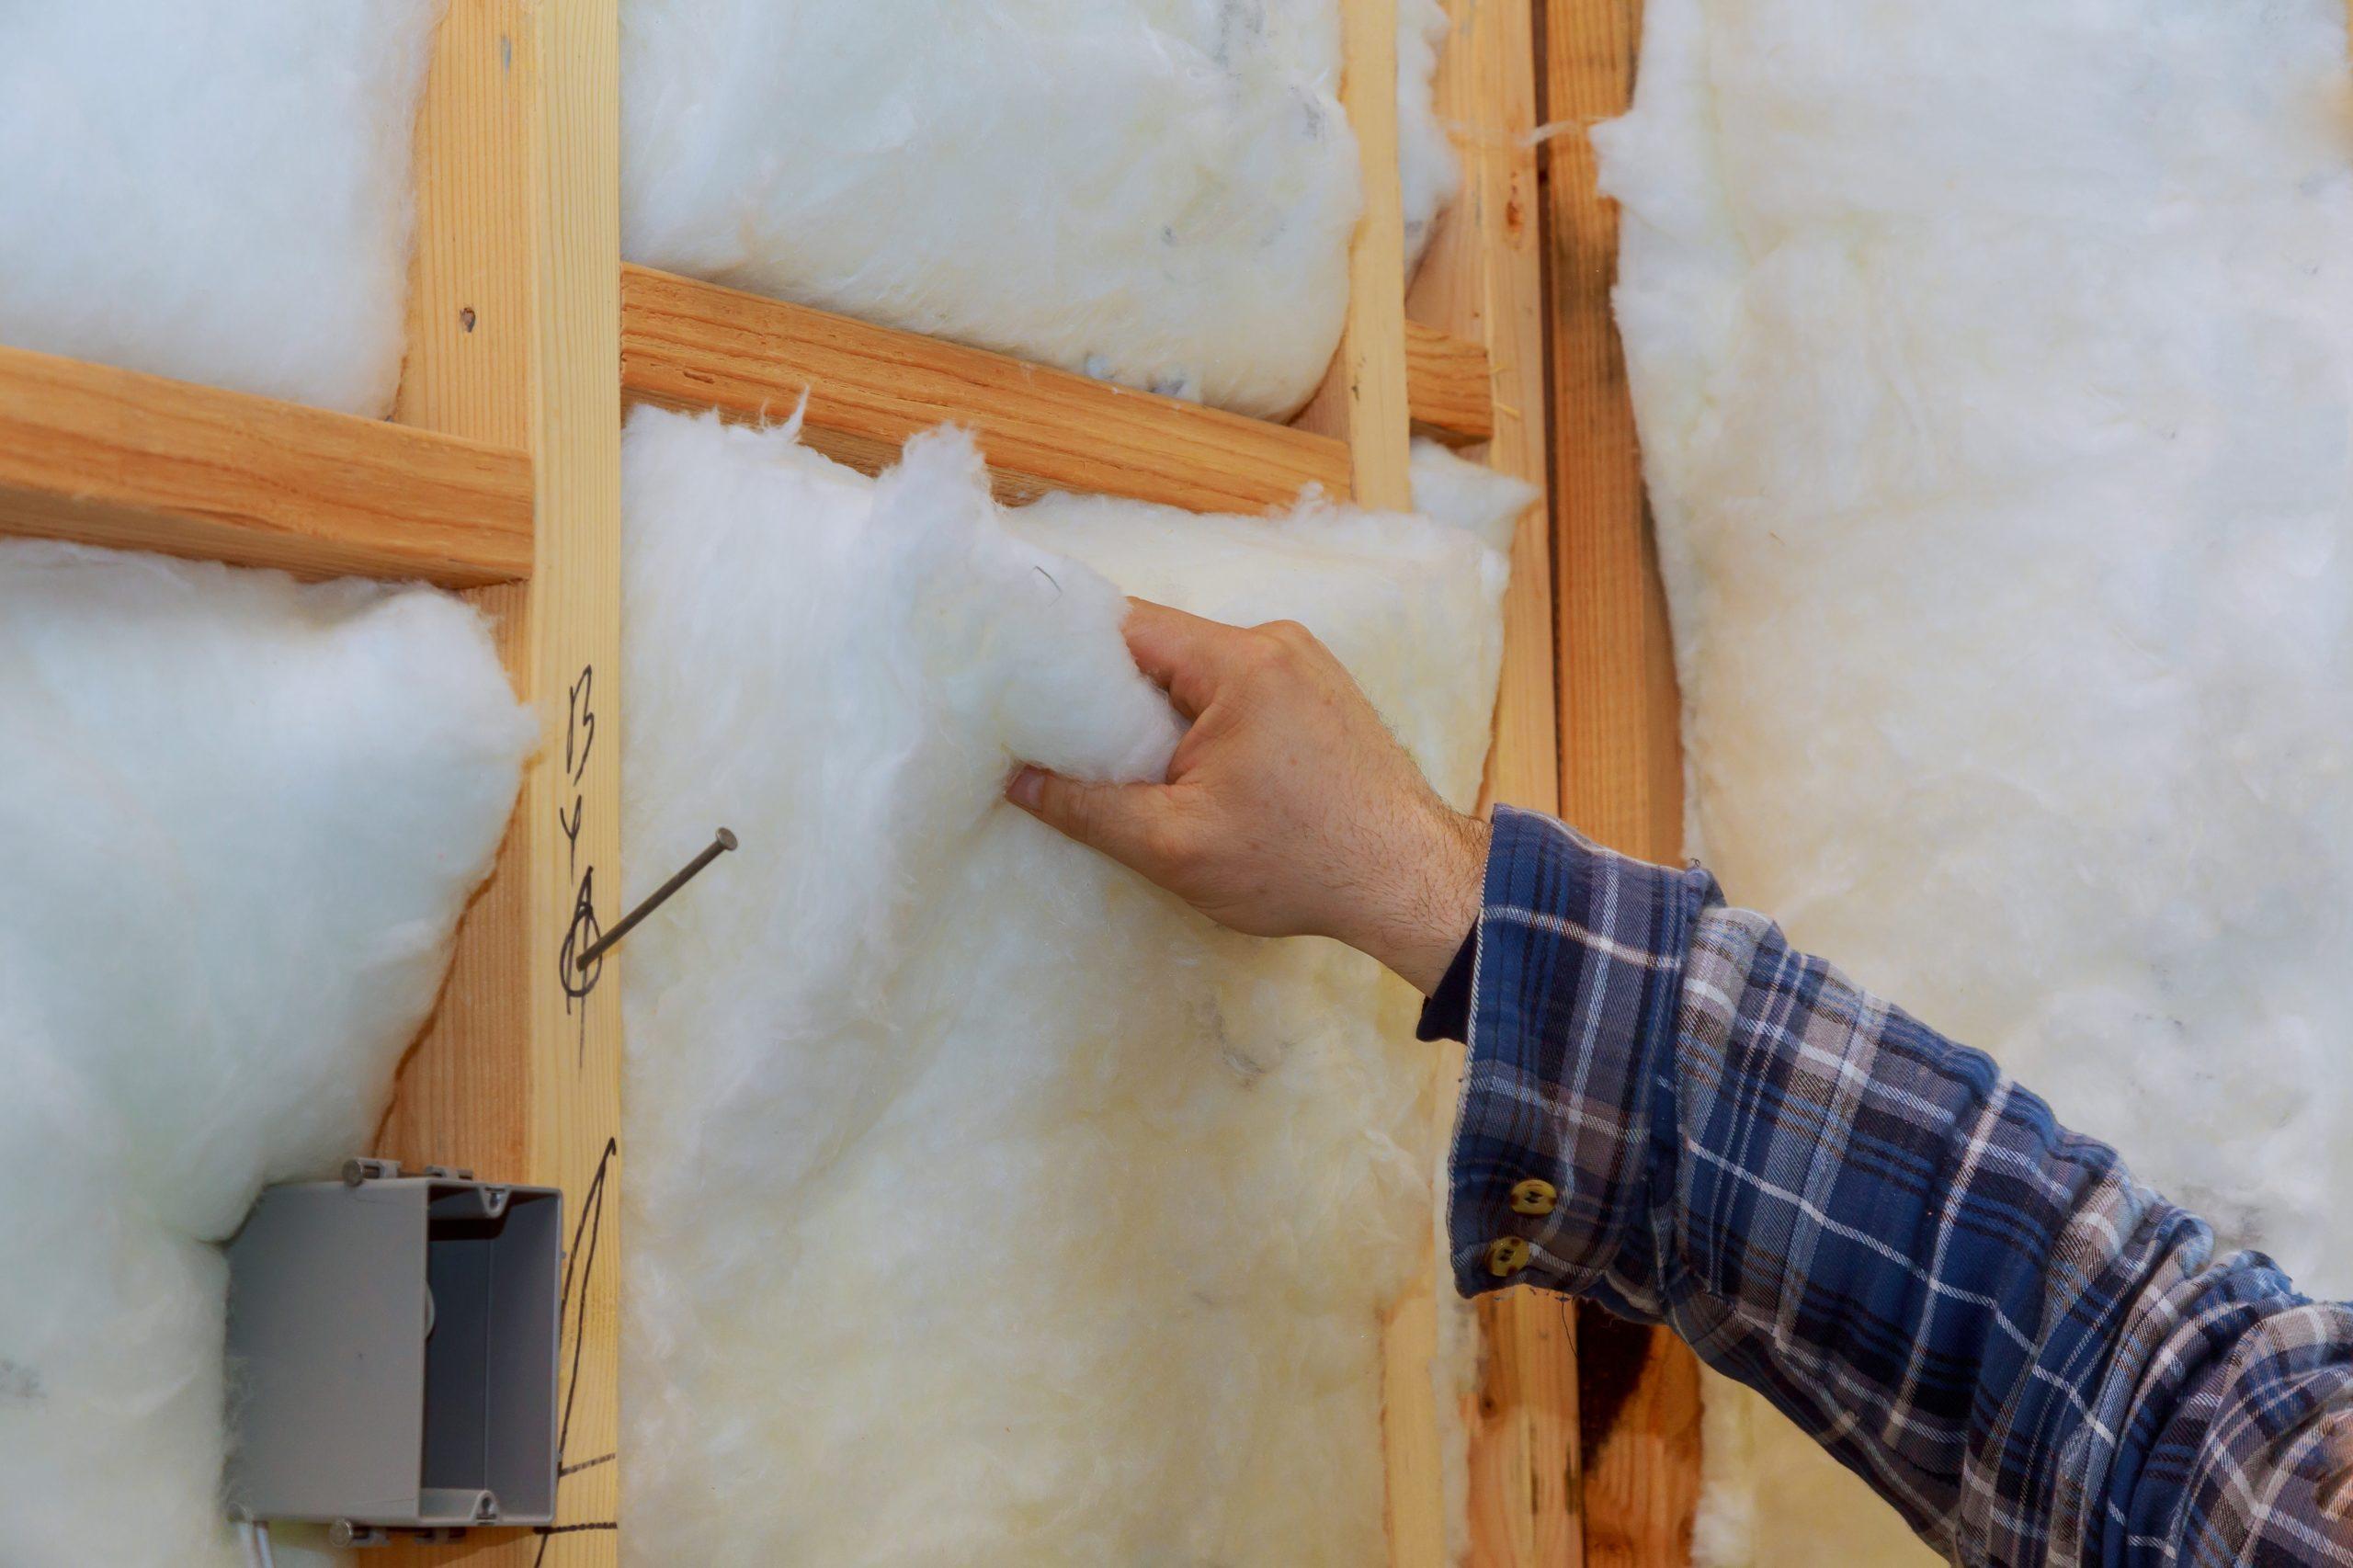 Adding insulation like radiant barrier